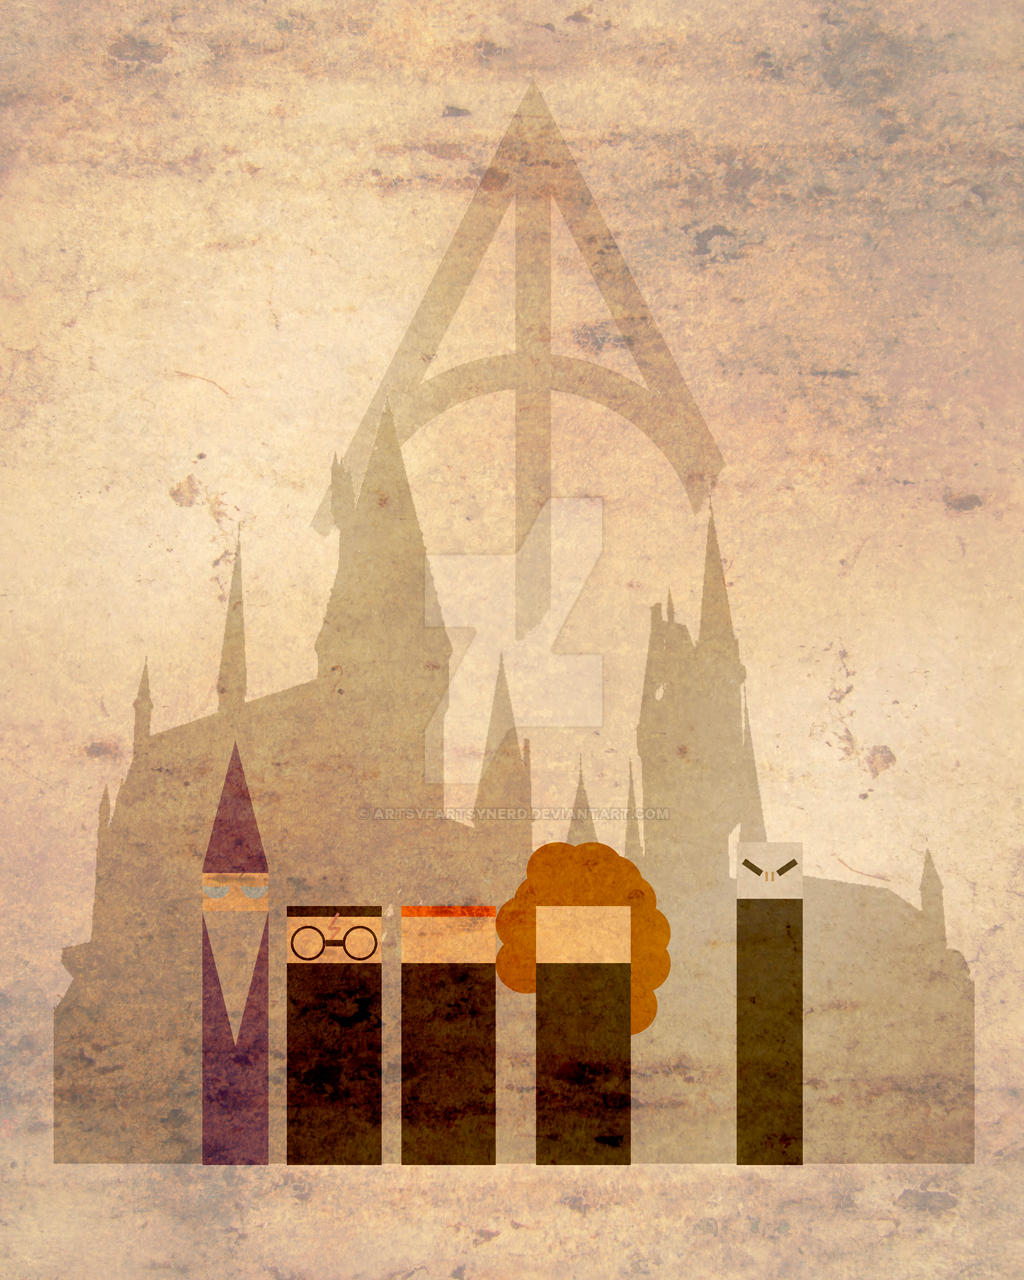 Amazing Wallpaper Harry Potter Minimalistic - harry_potter_minimalist_poster_by_artsyfartsynerd-d7ftmzf  Snapshot_95563.jpg